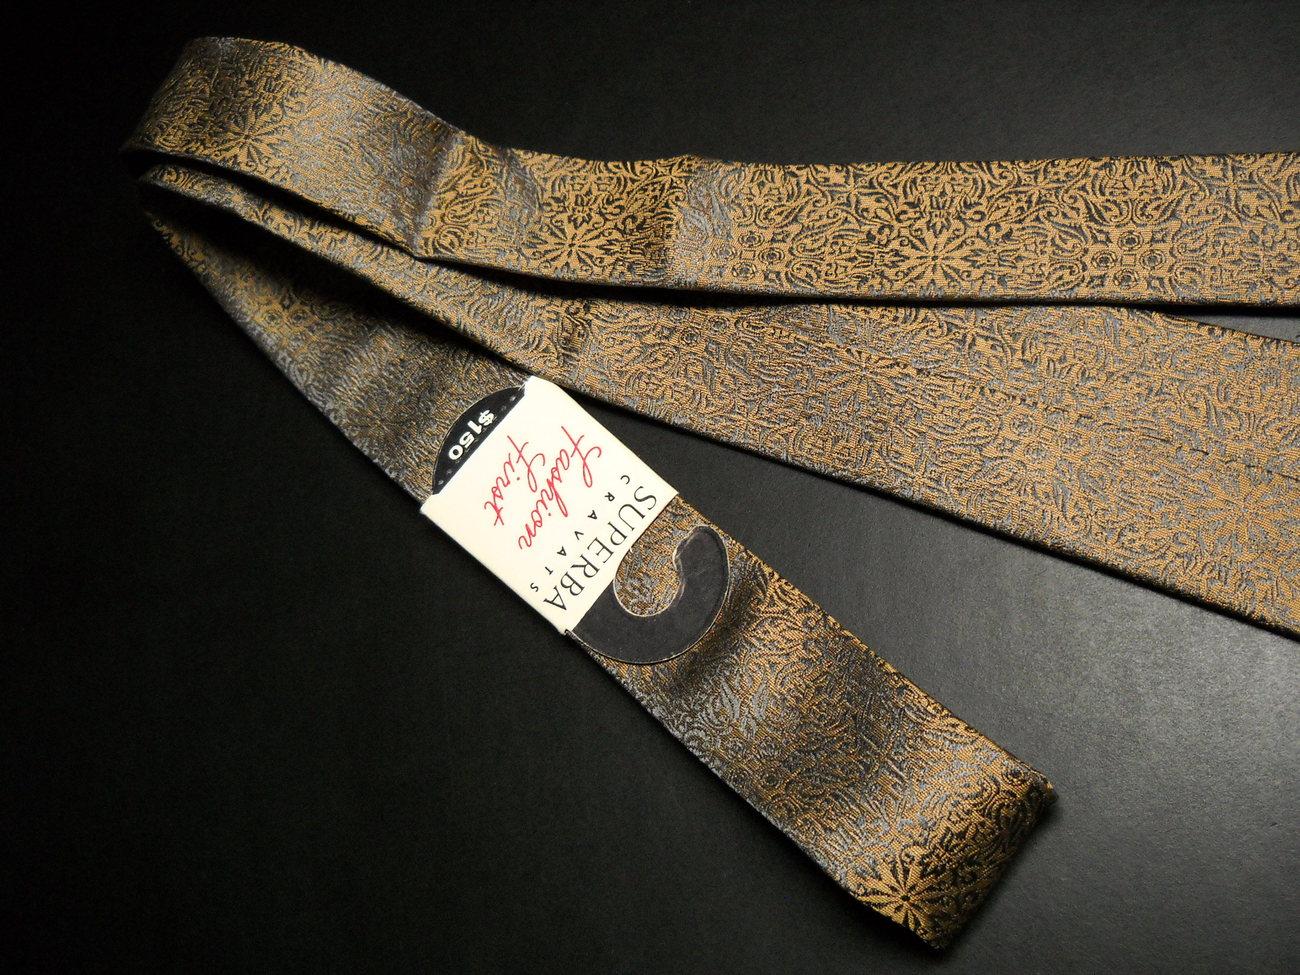 Superba Sleeved Neck Tie The Harvard Canton Vintage Skinny Browns Slight Sheen